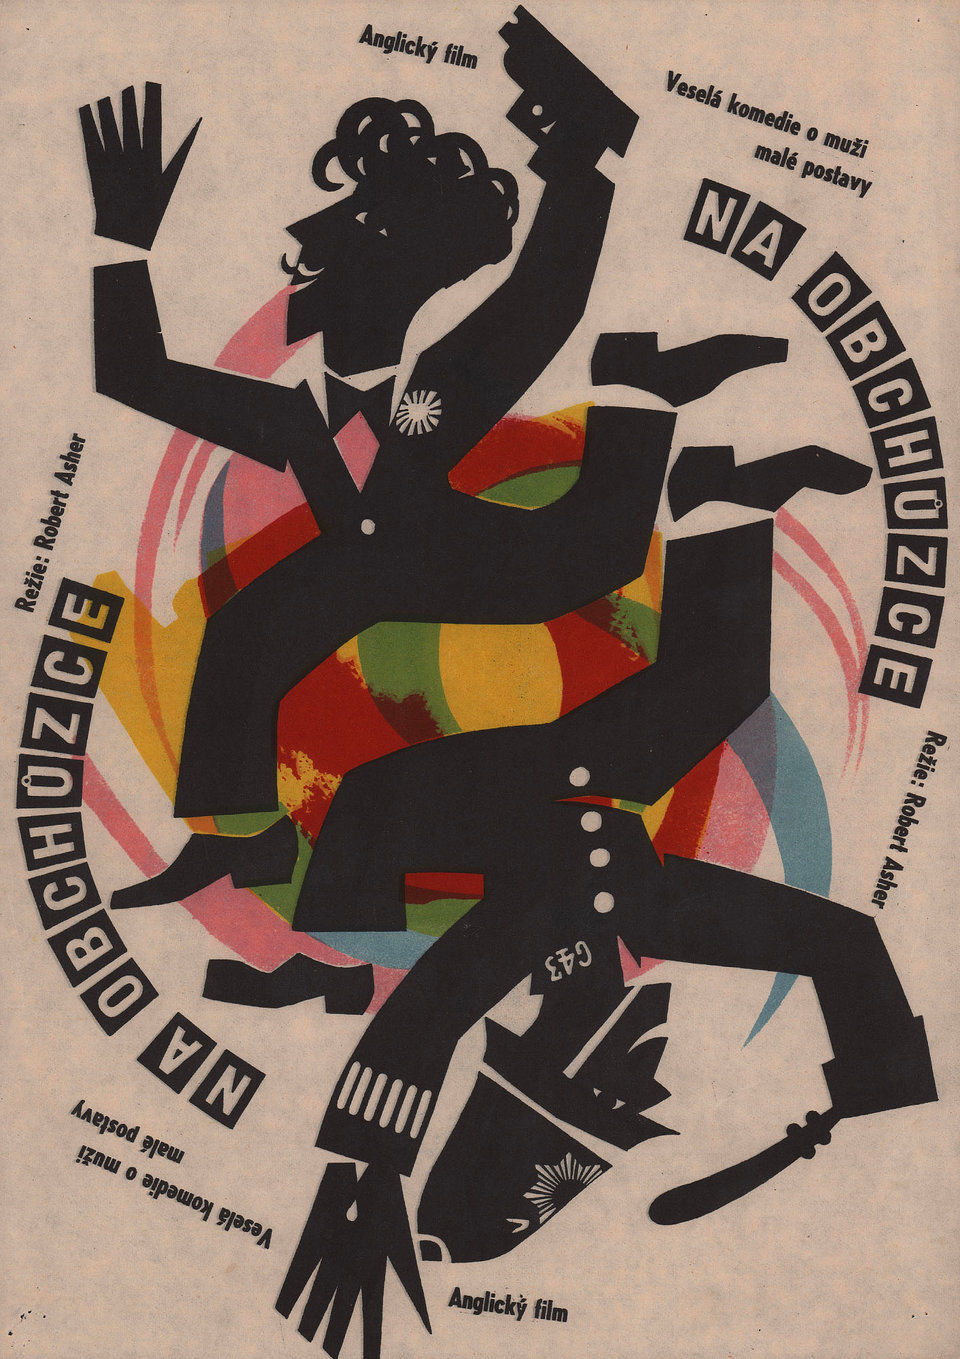 on-the-beat-1963-original-czech-movie-poster